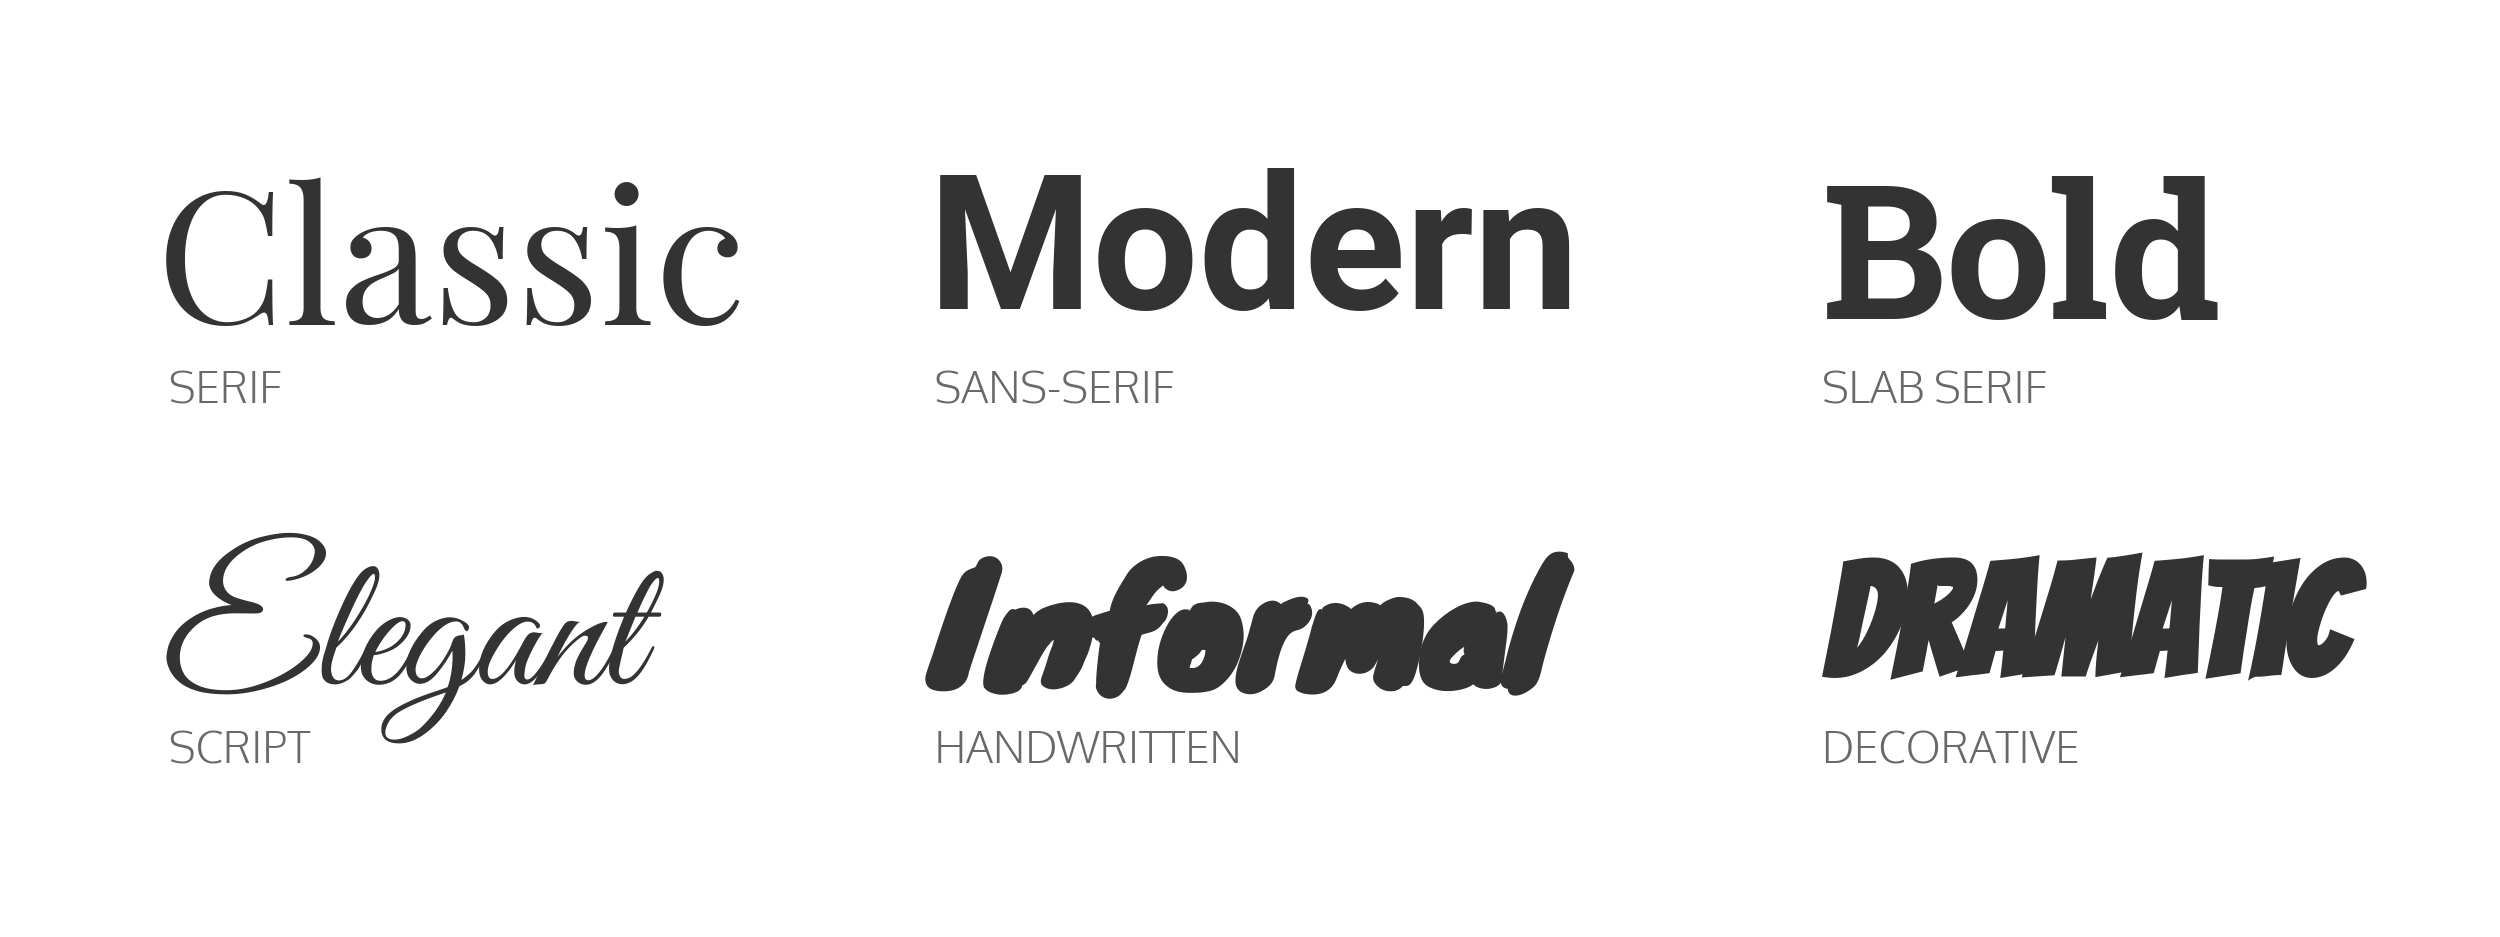 Verschillende lettertypes